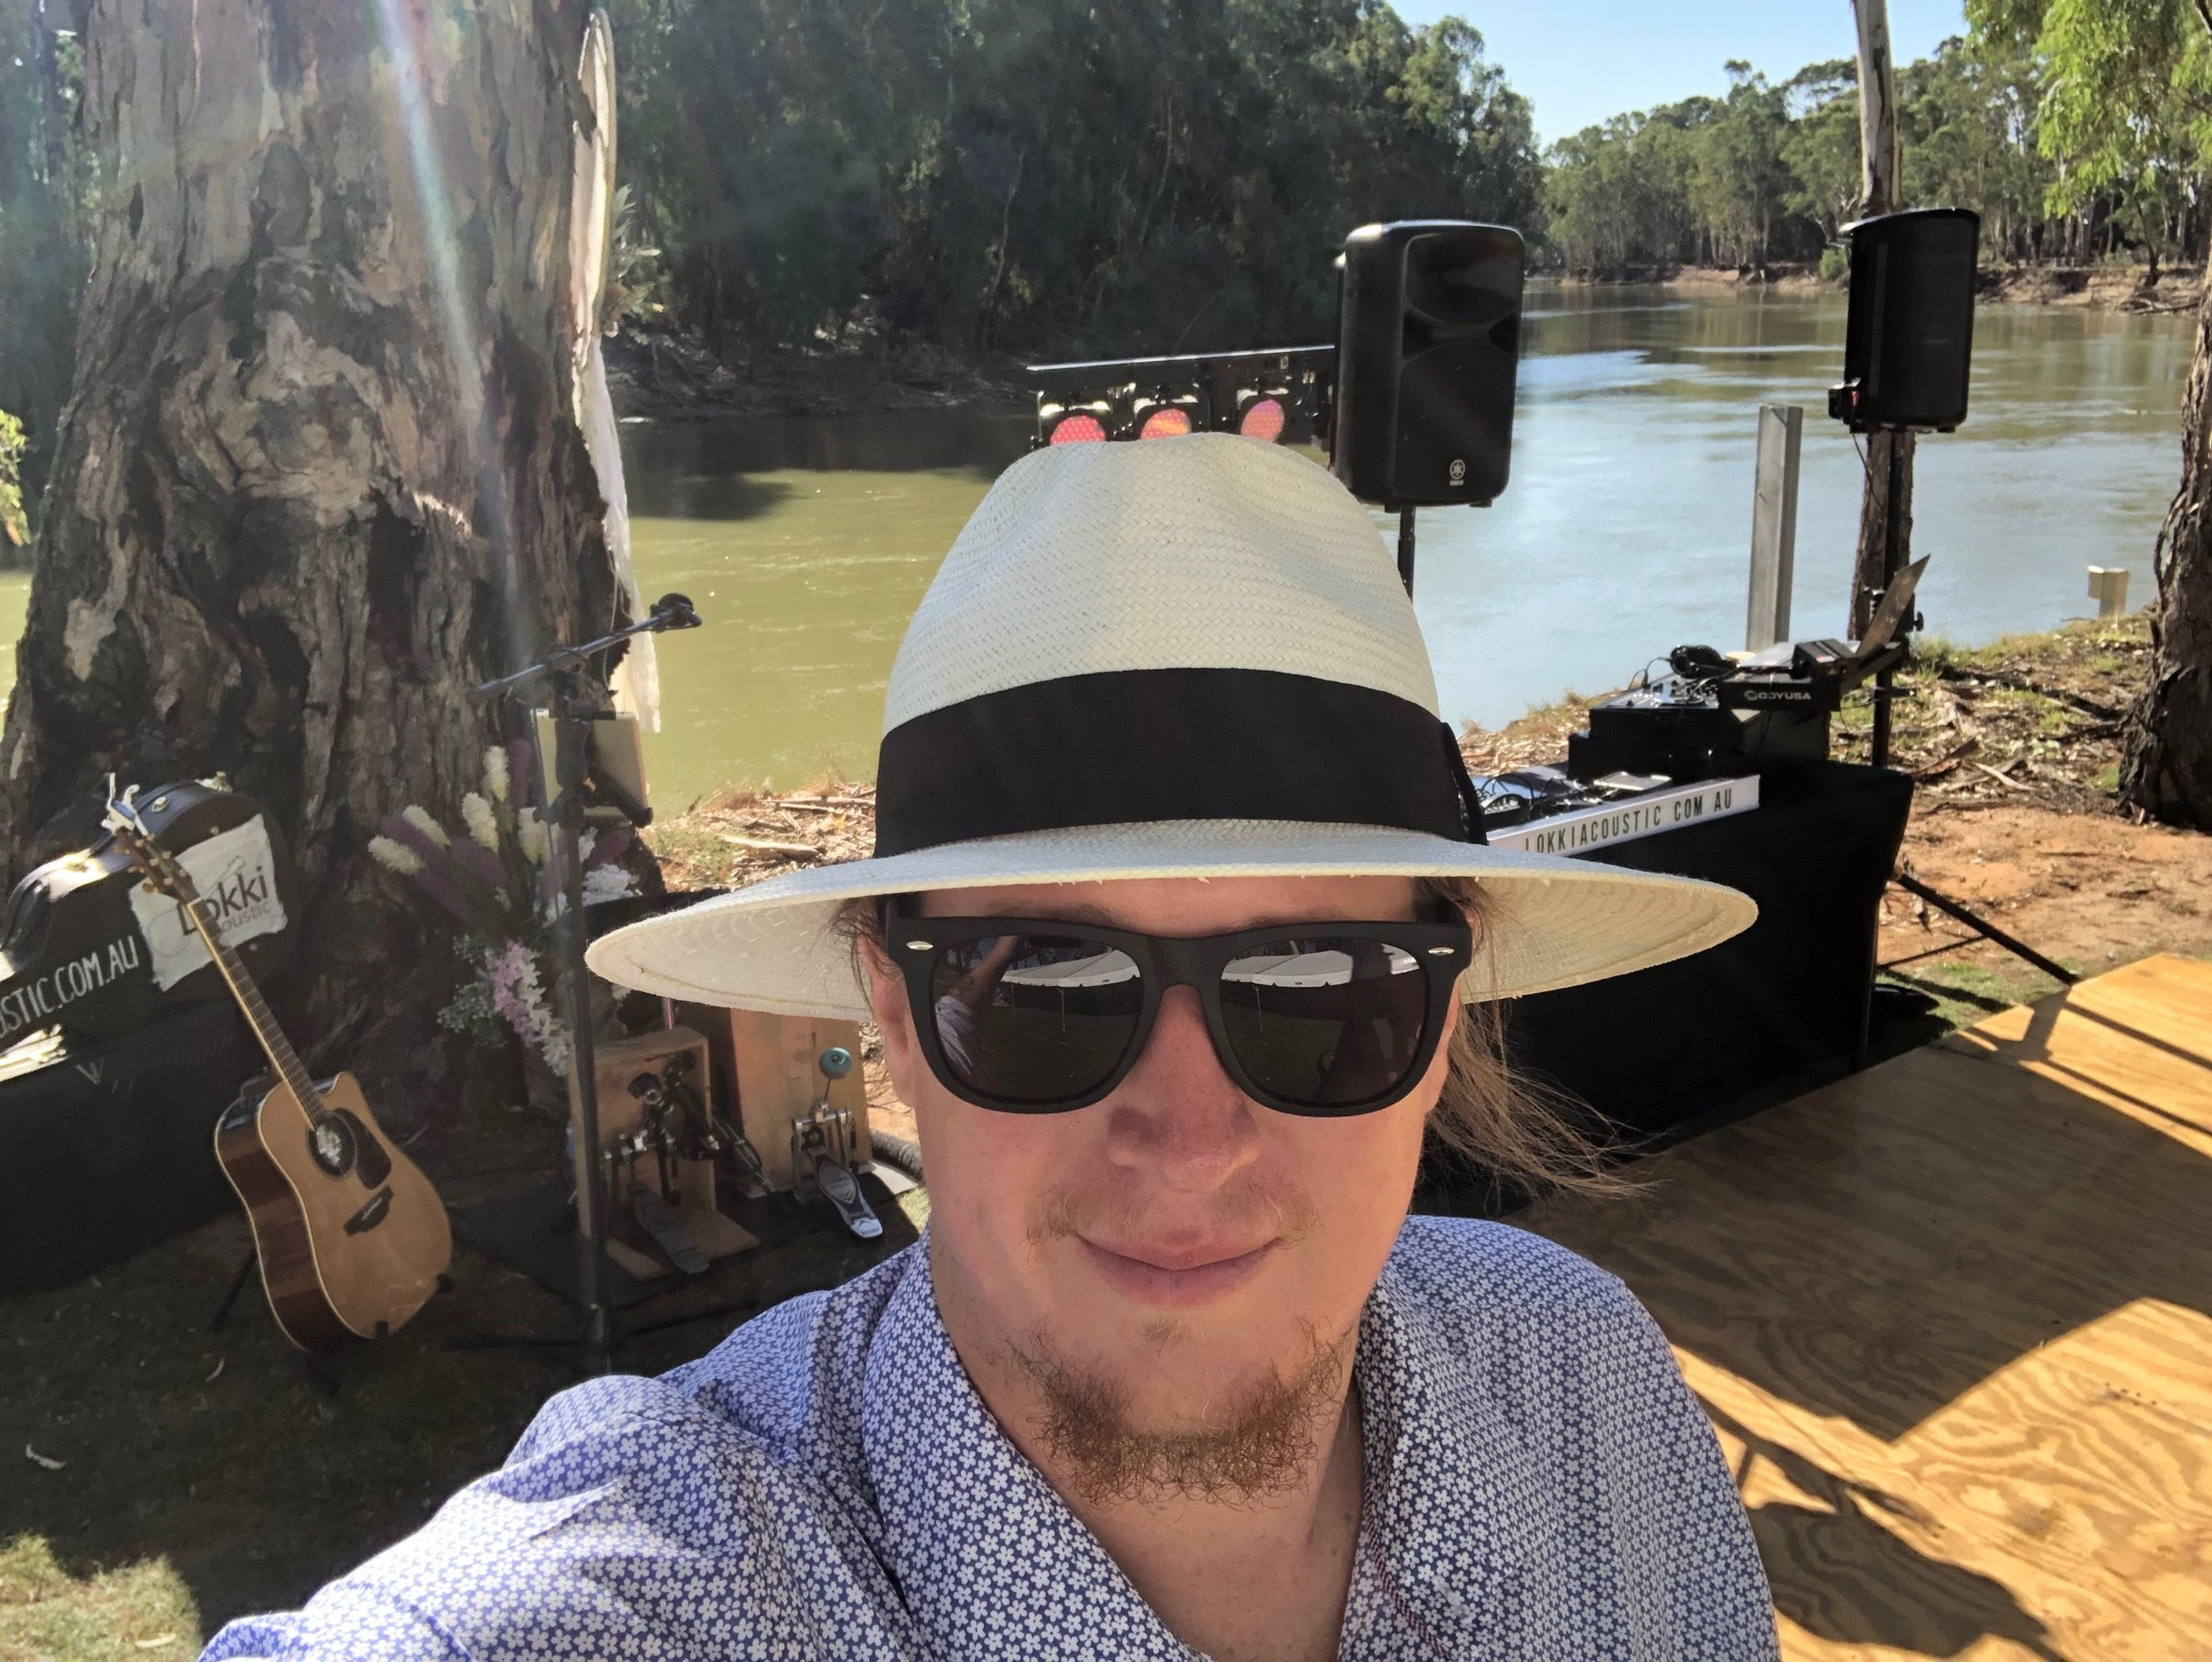 River side wedding musician and DJ set up in Barham